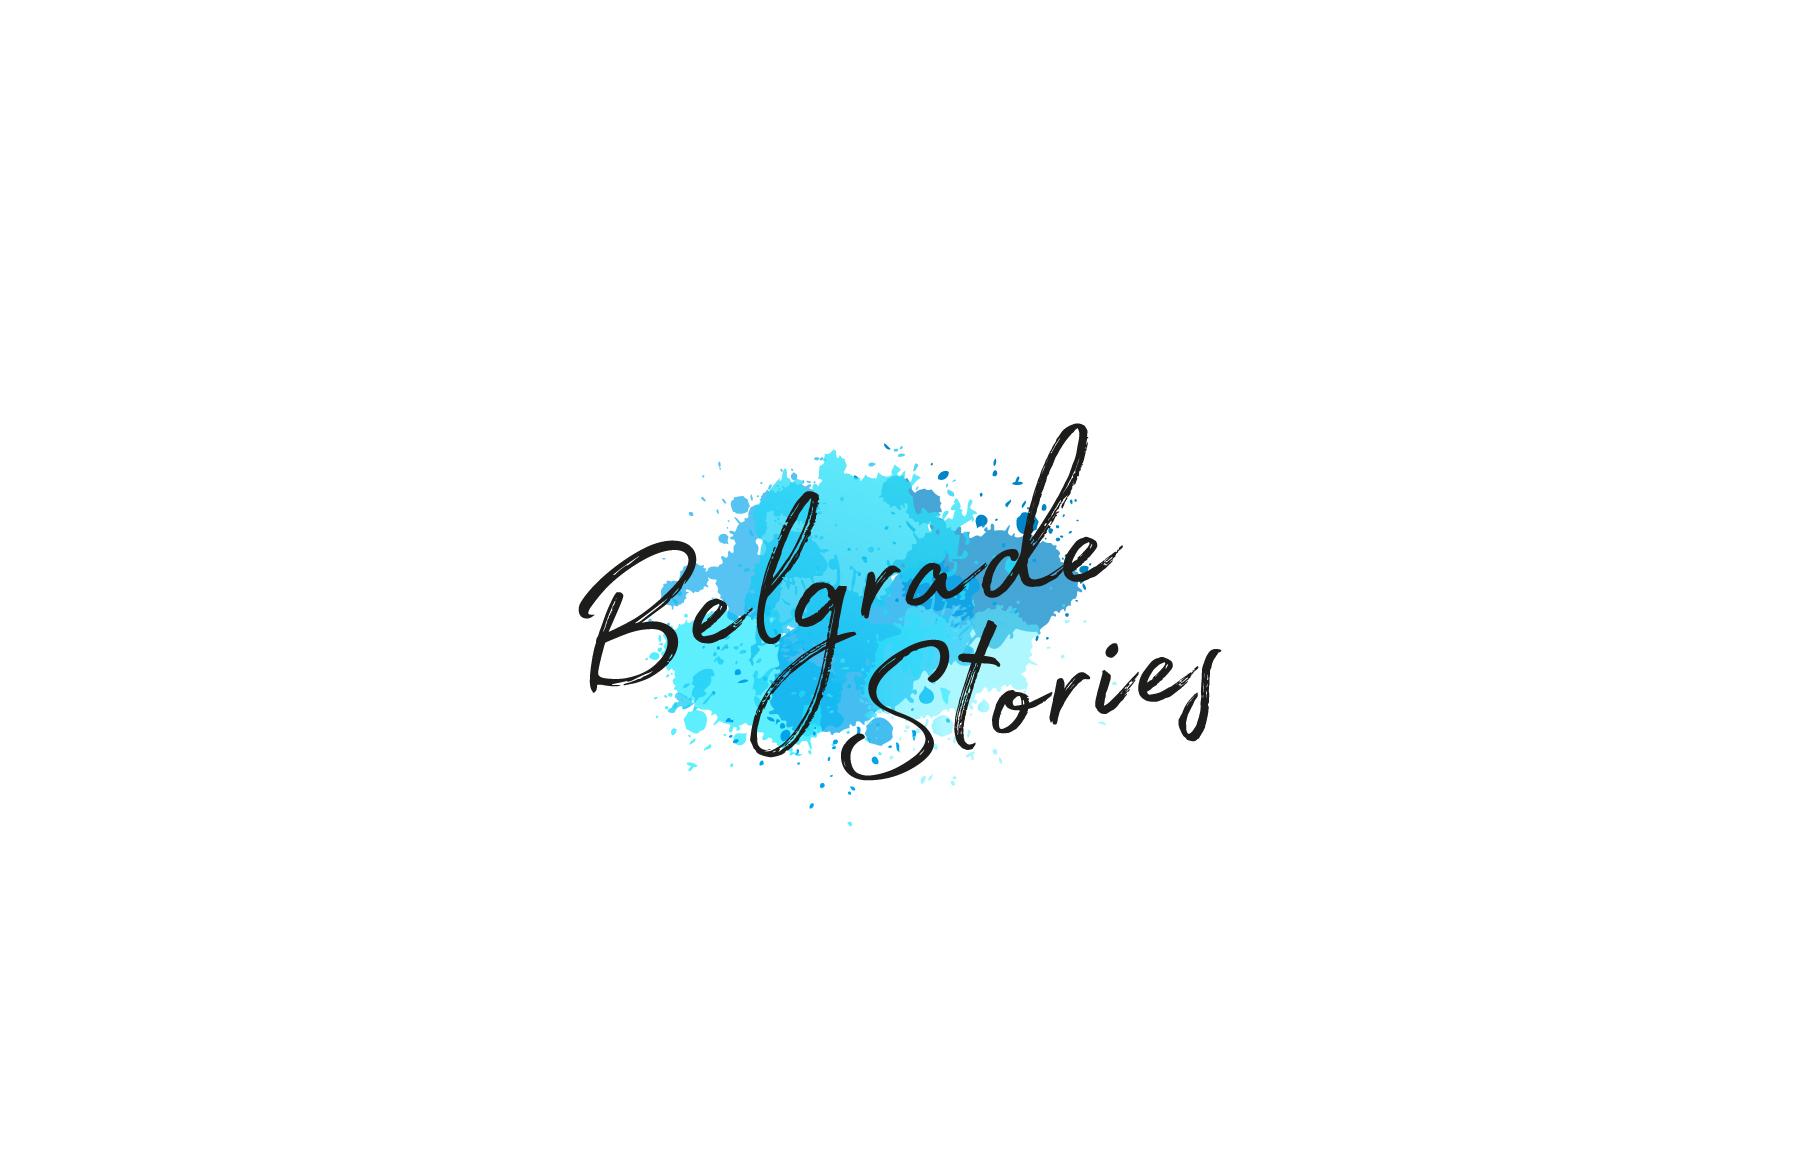 Логотип для агентства городских туров в Белграде фото f_97758913a4edc966.jpg